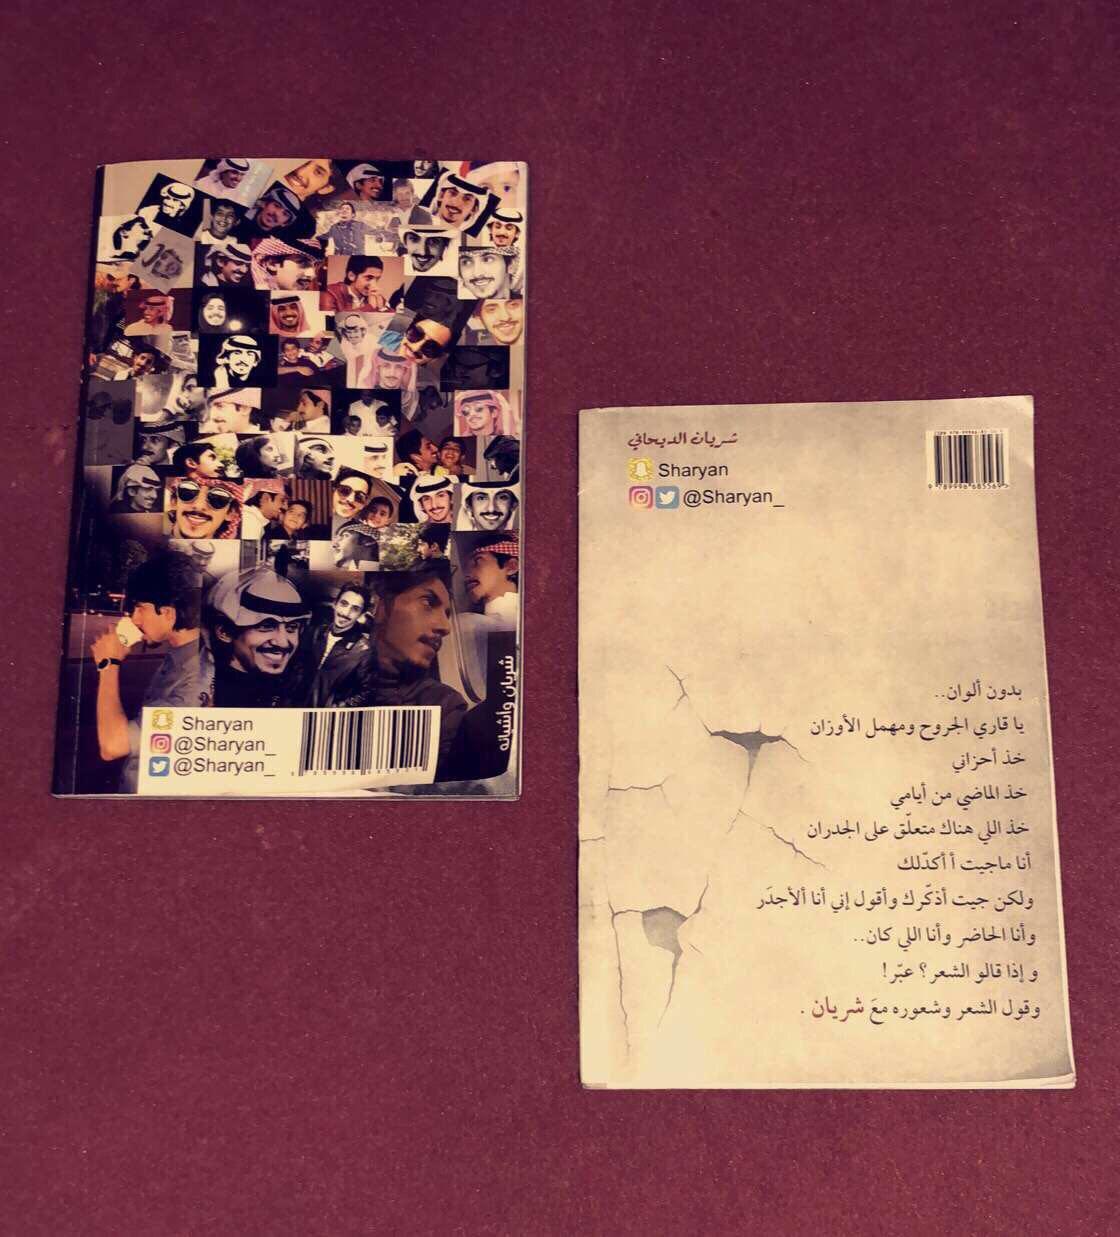 قراءه كتاب هوى شريان الديحاني